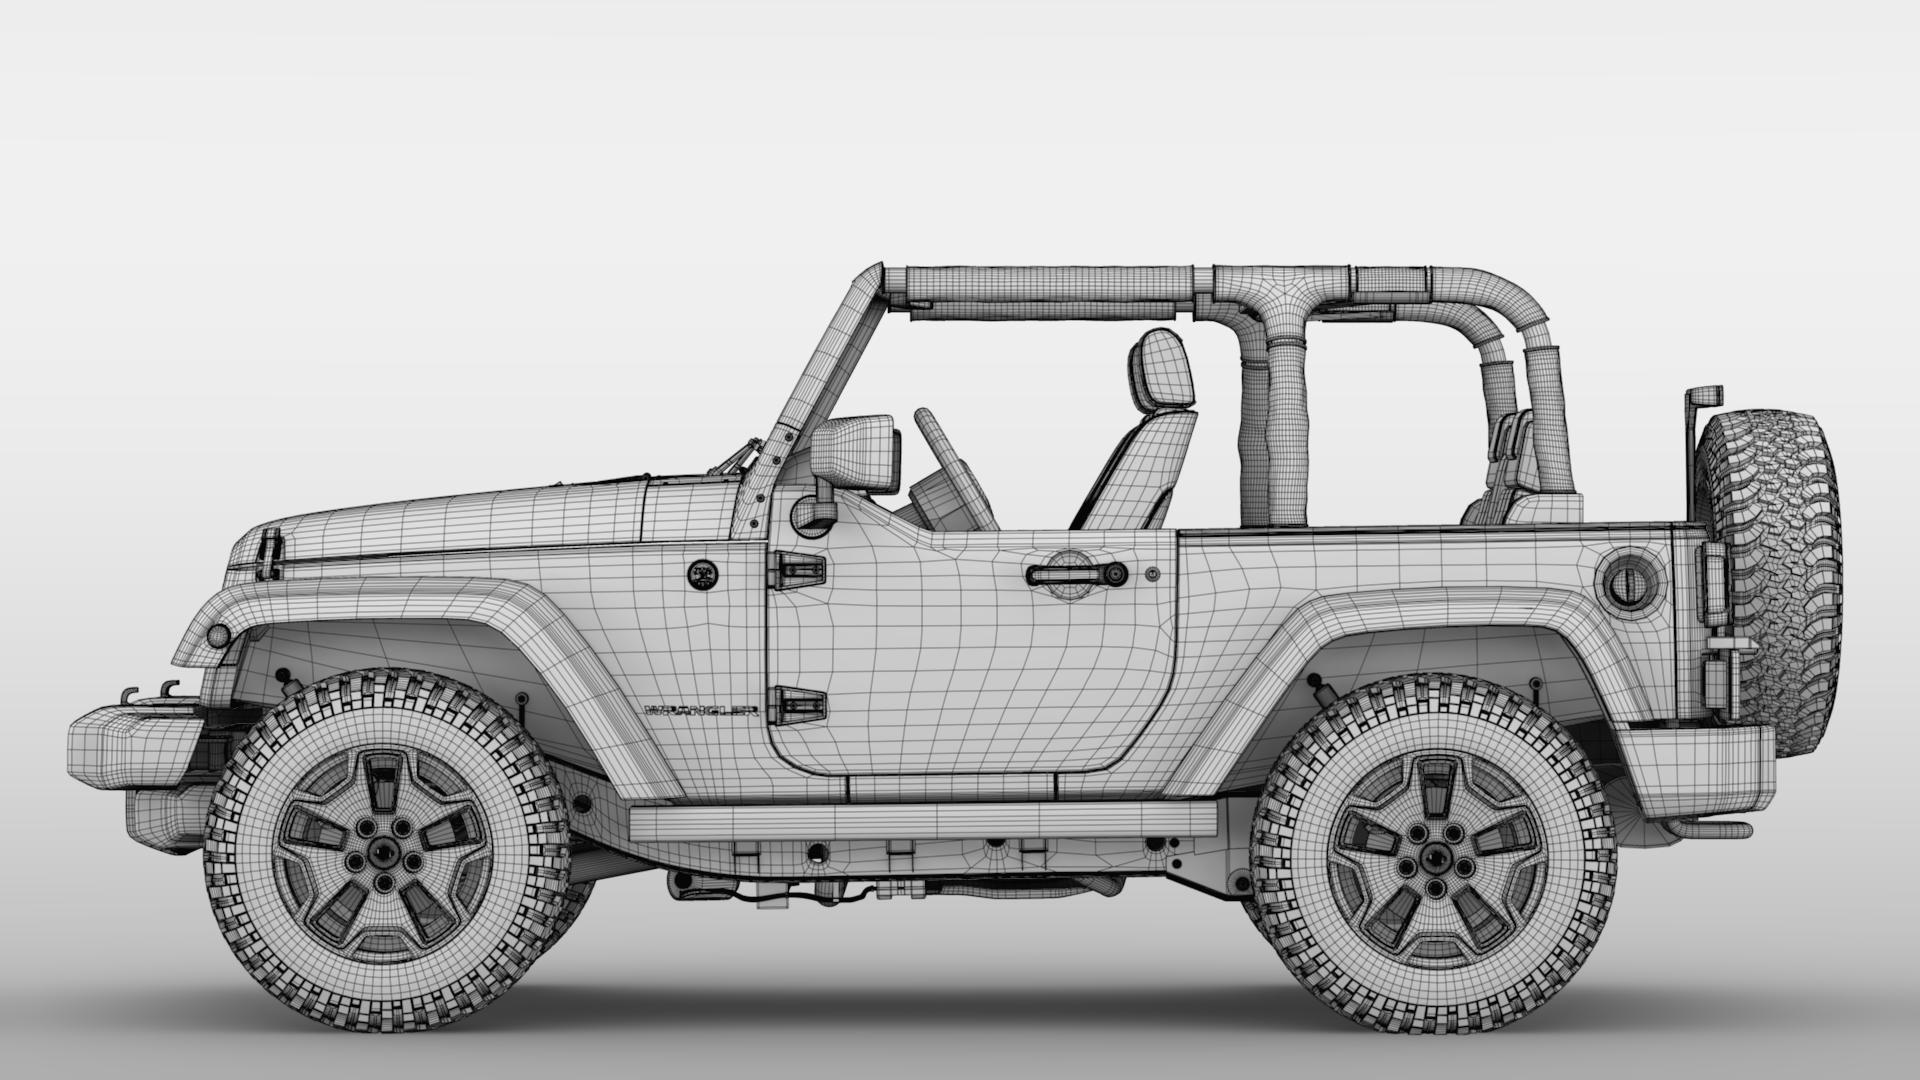 jeep wrangler willys wheeler jk 2017 3d model max fbx c4d lwo ma mb hrc xsi obj 276812